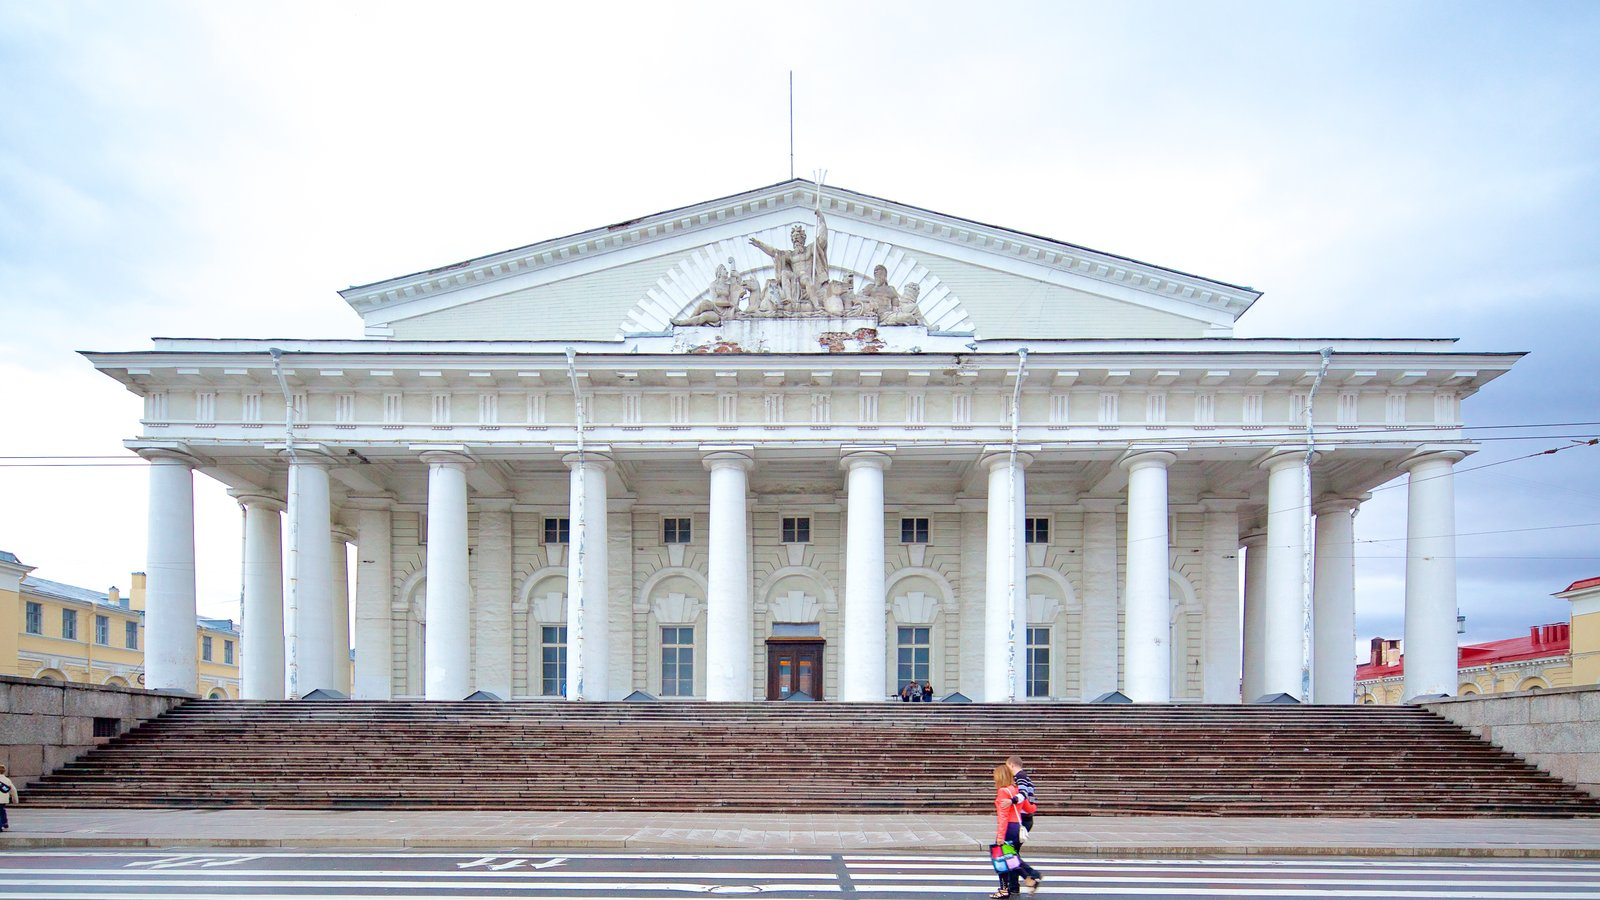 Strelka mostrando arquitetura de patrimônio